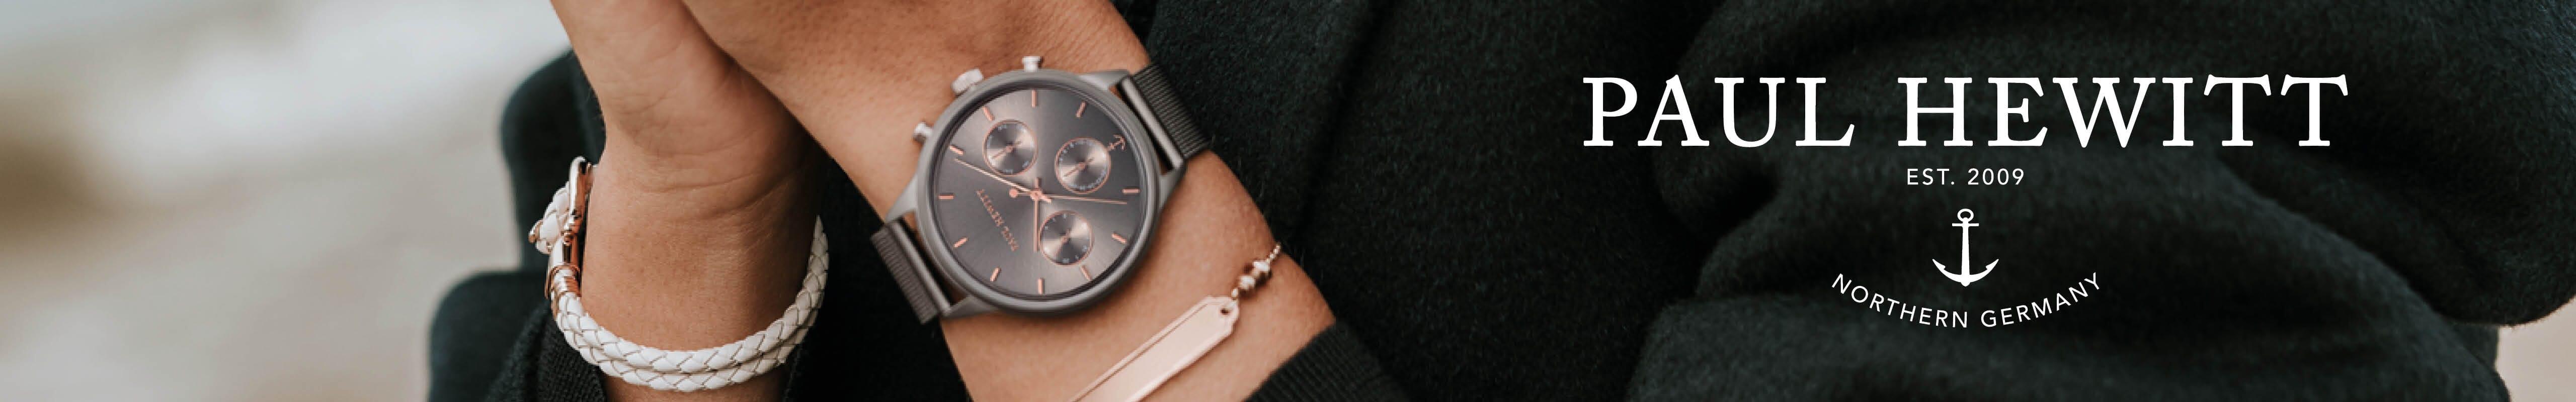 Paul Hewitt Horloges